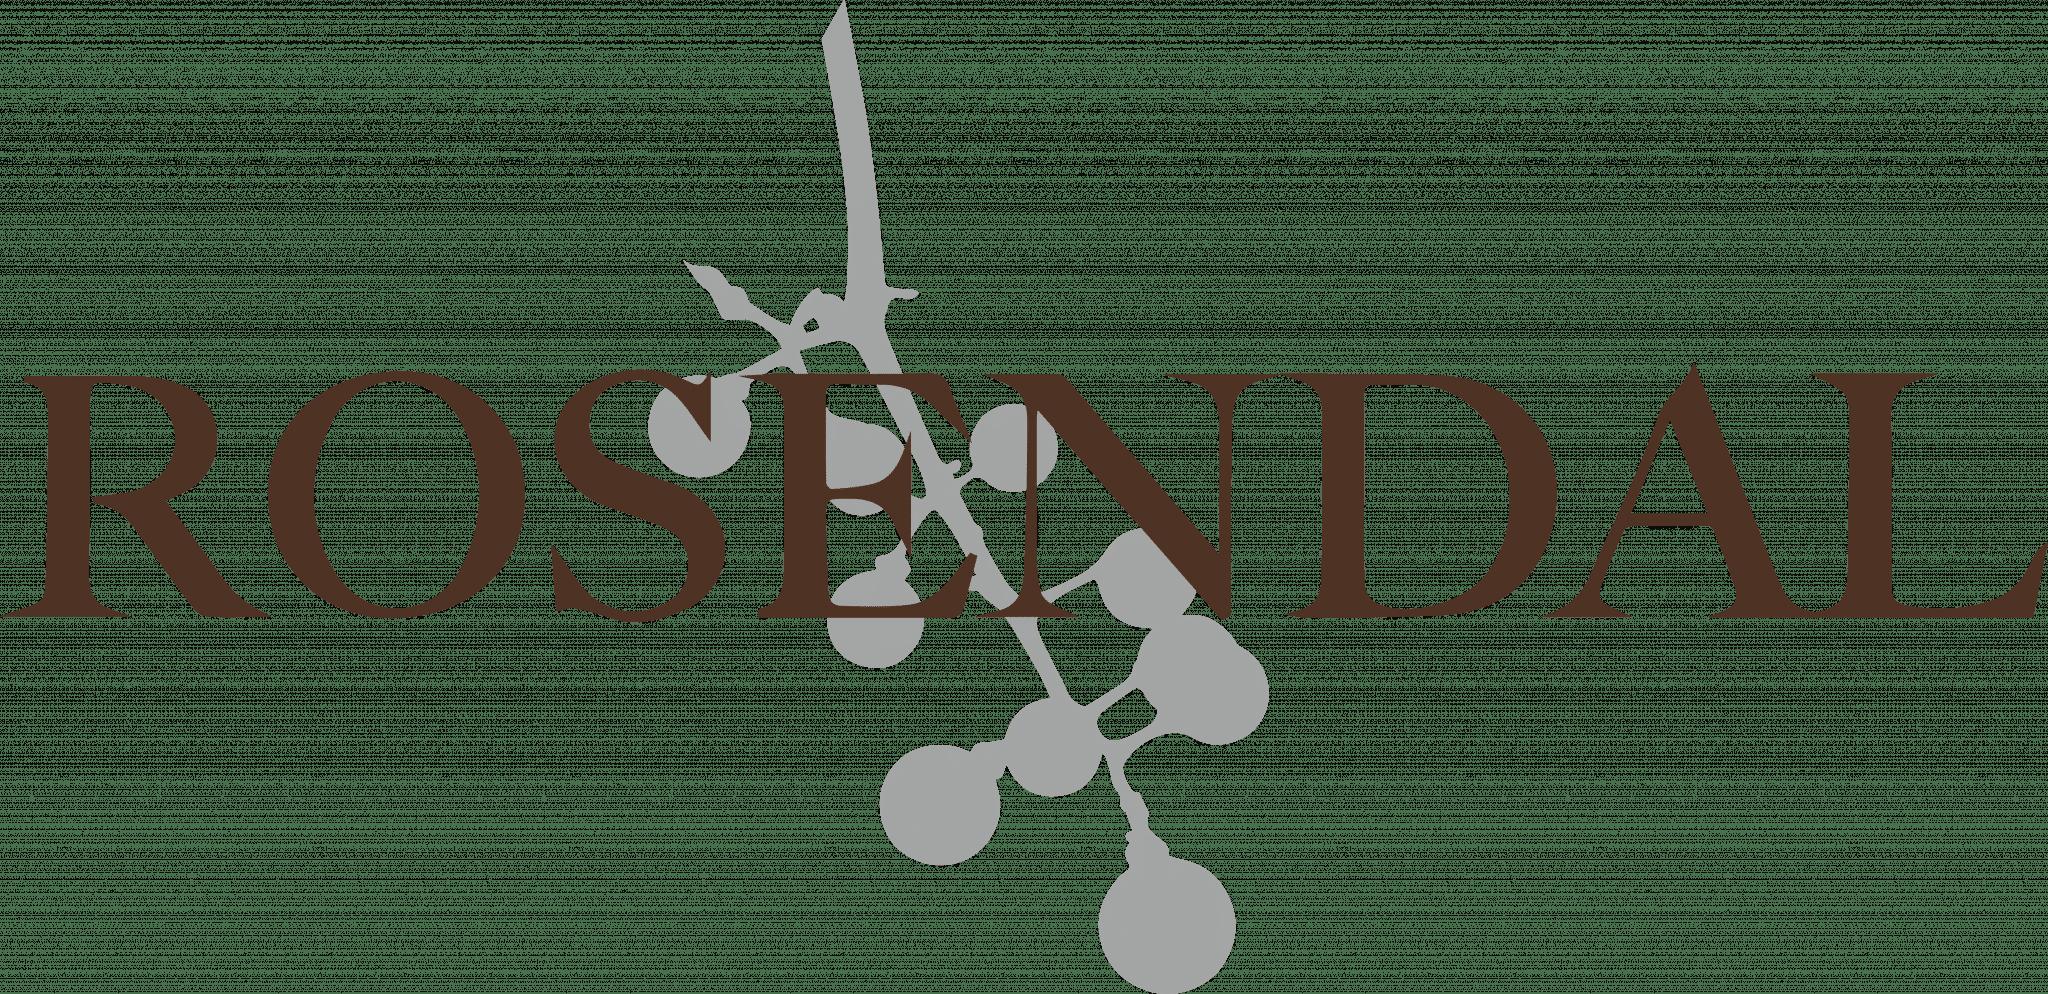 Rosendal_Logo_High_Res_b8830f4d-29e0-42f7-ab40-88bd428e1fc9_5404x